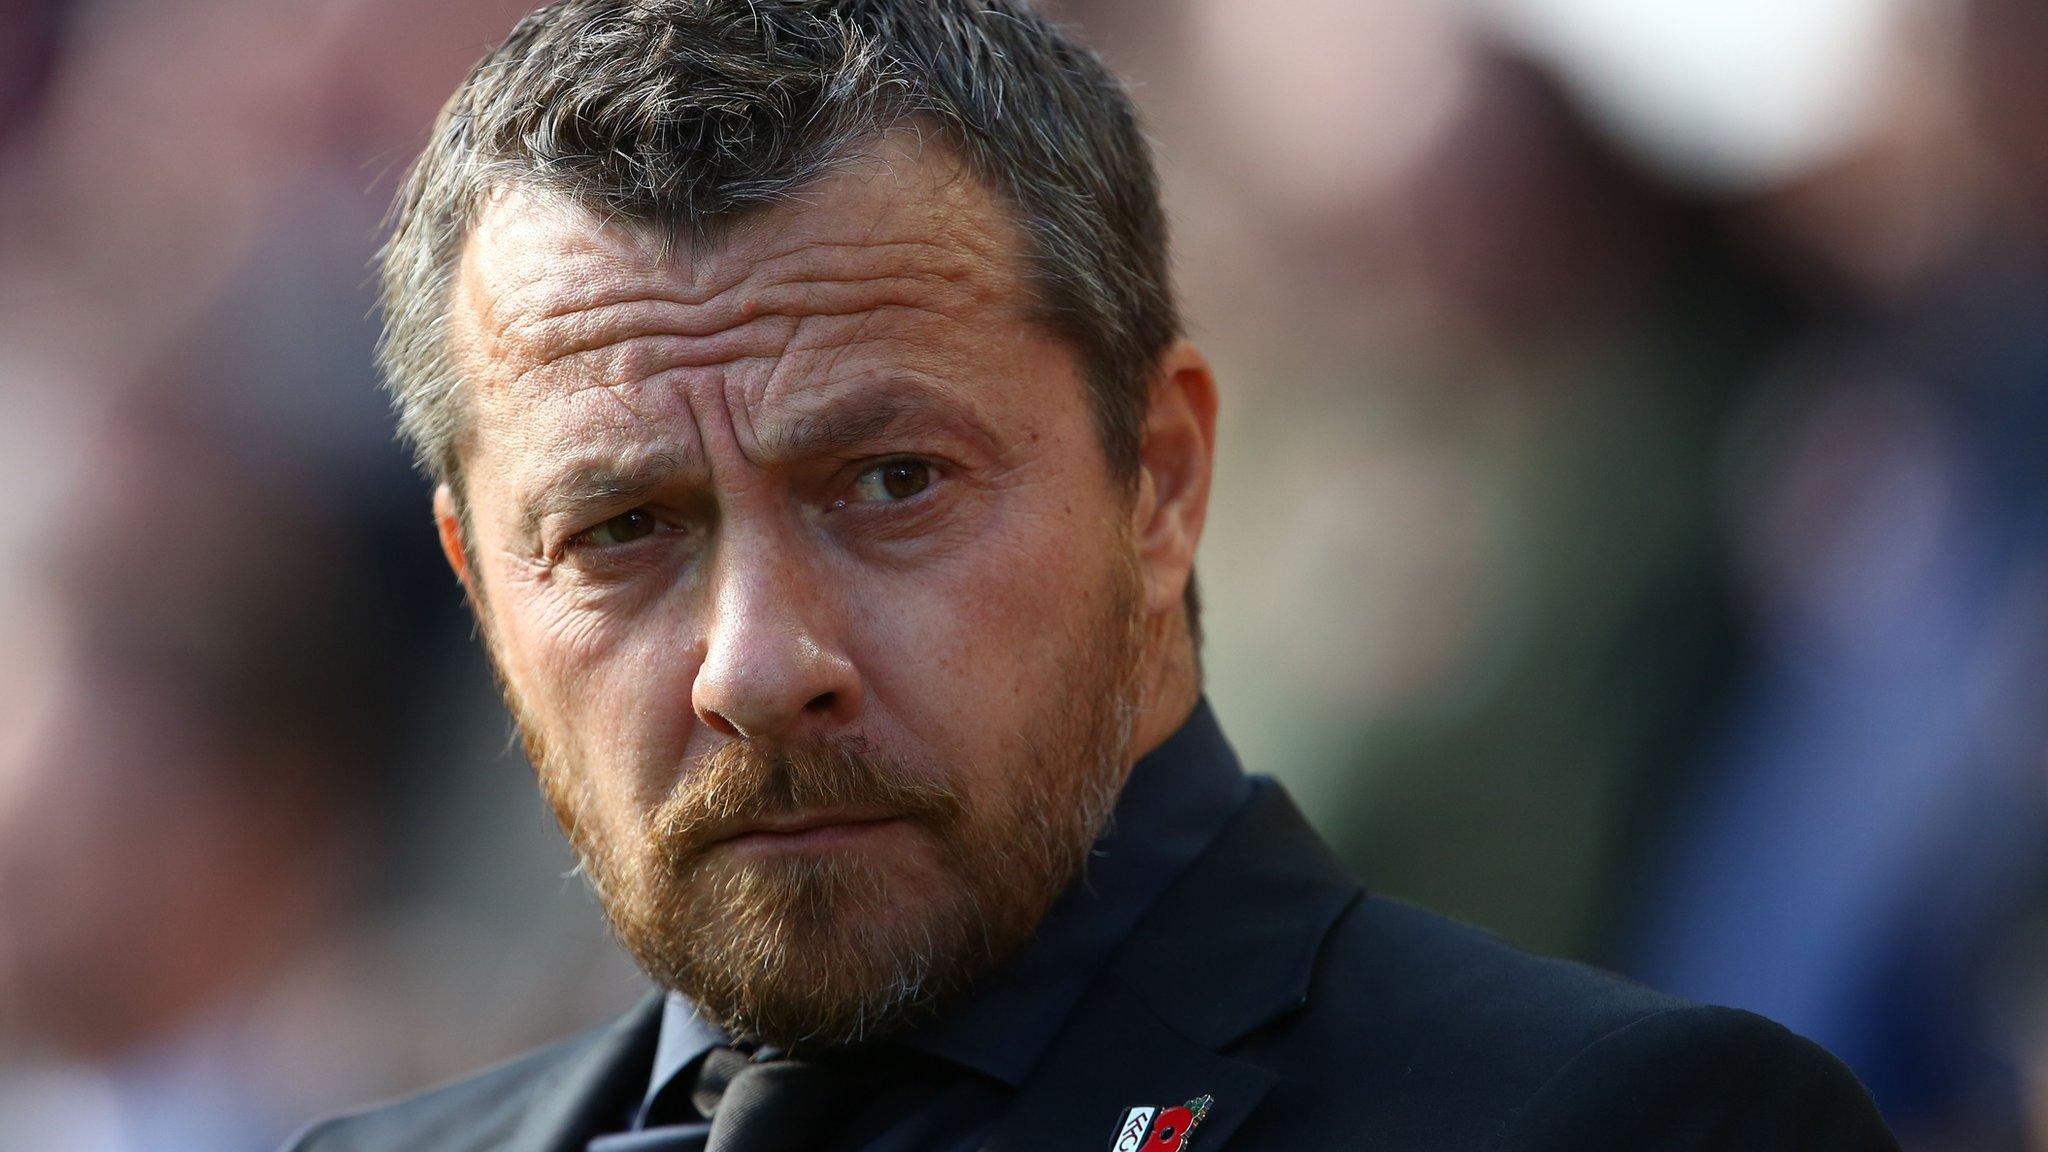 Slavisa Jokanovic: Former Fulham manager appointed at Qatar Super League side Al-Gharafa